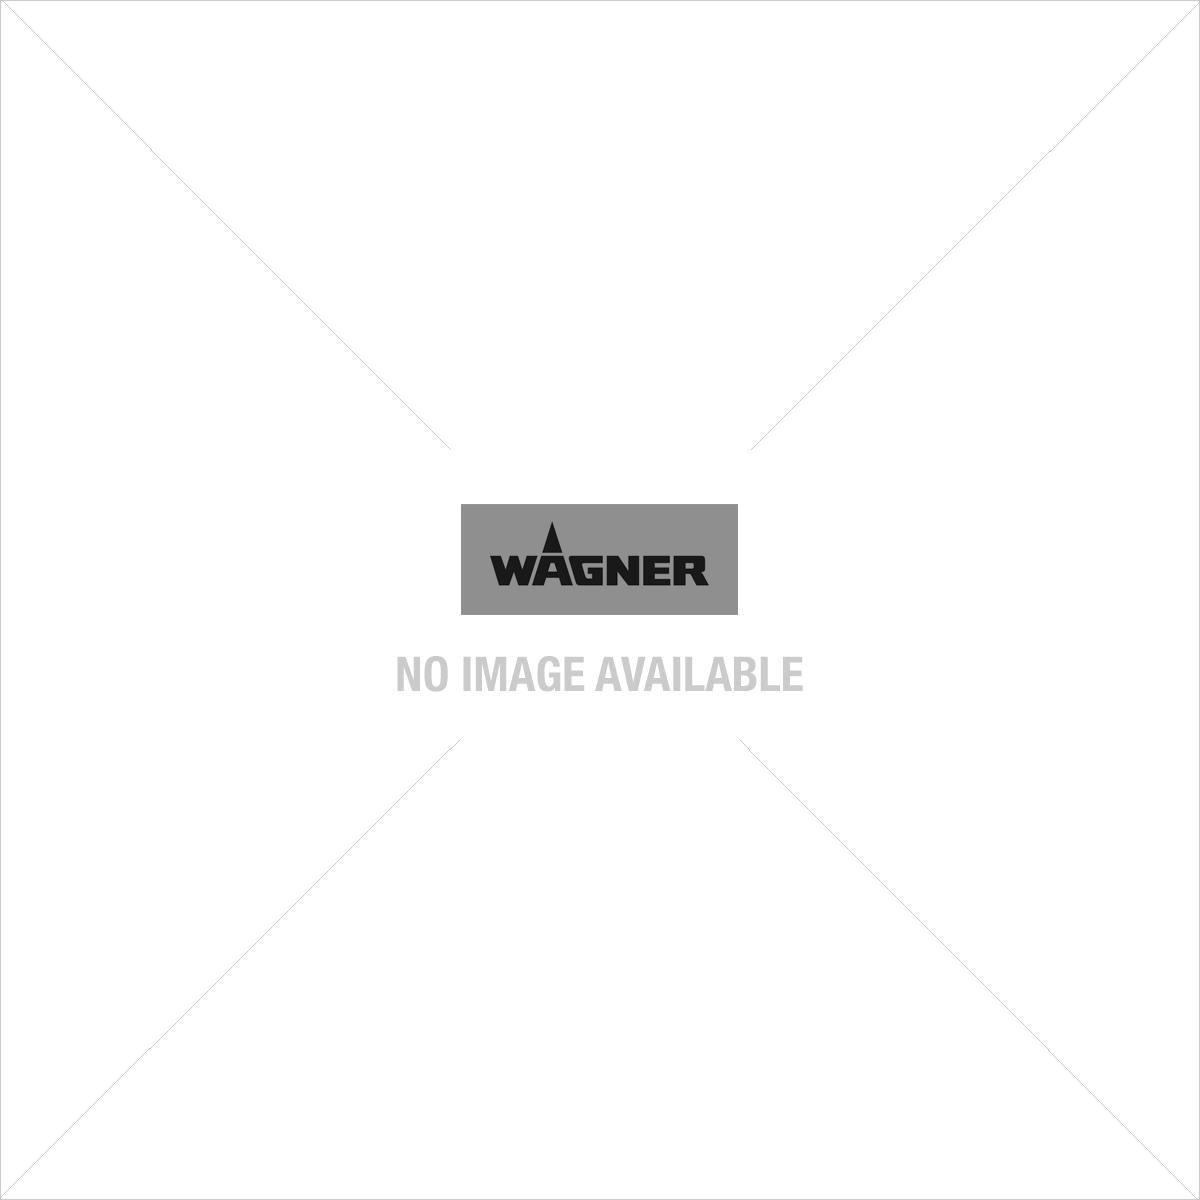 Poignee click and paint pour W 985